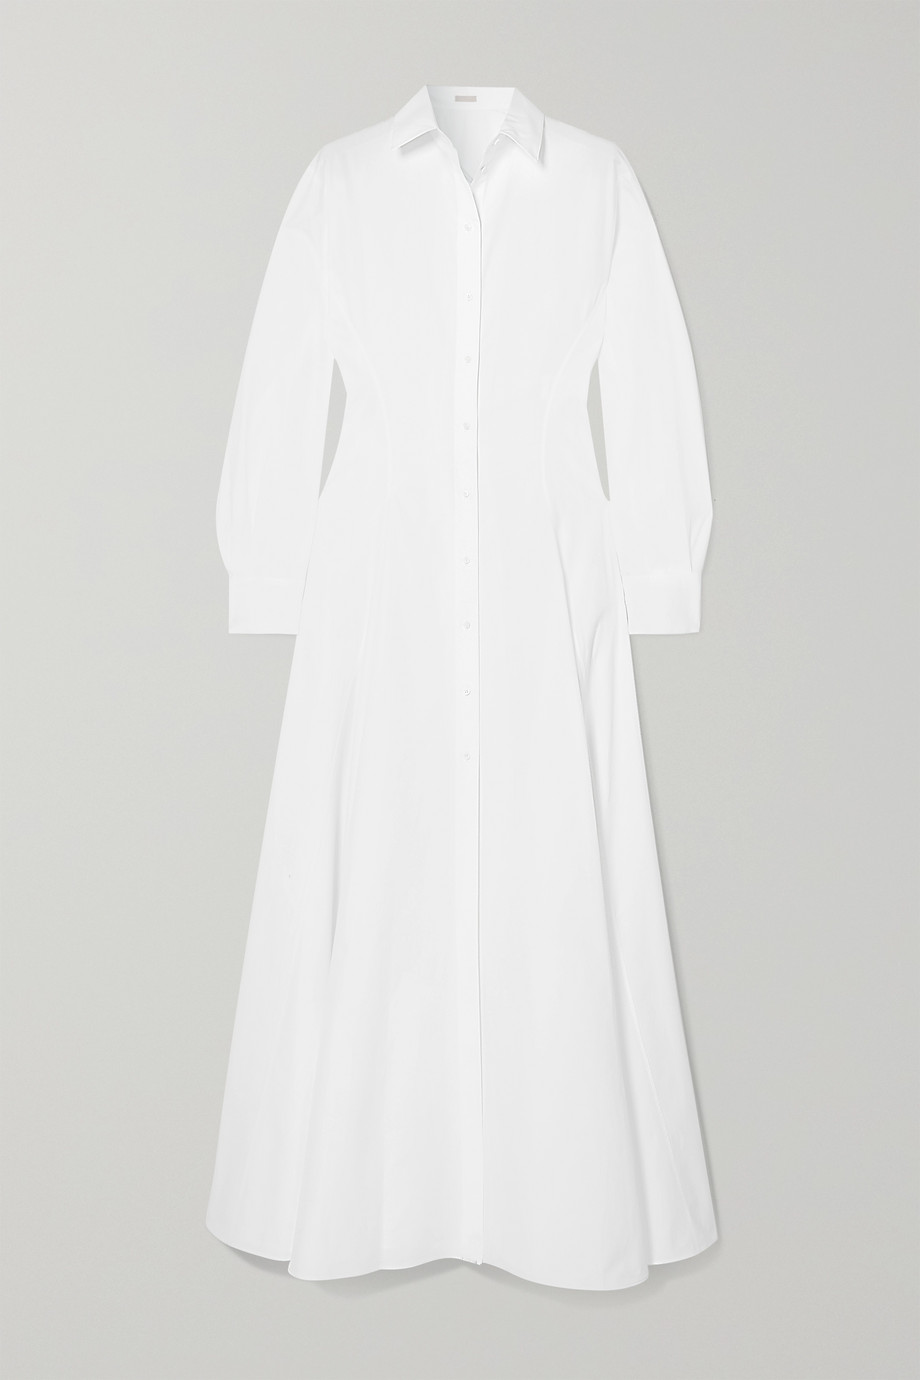 Alaïa Cotton-poplin maxi dress